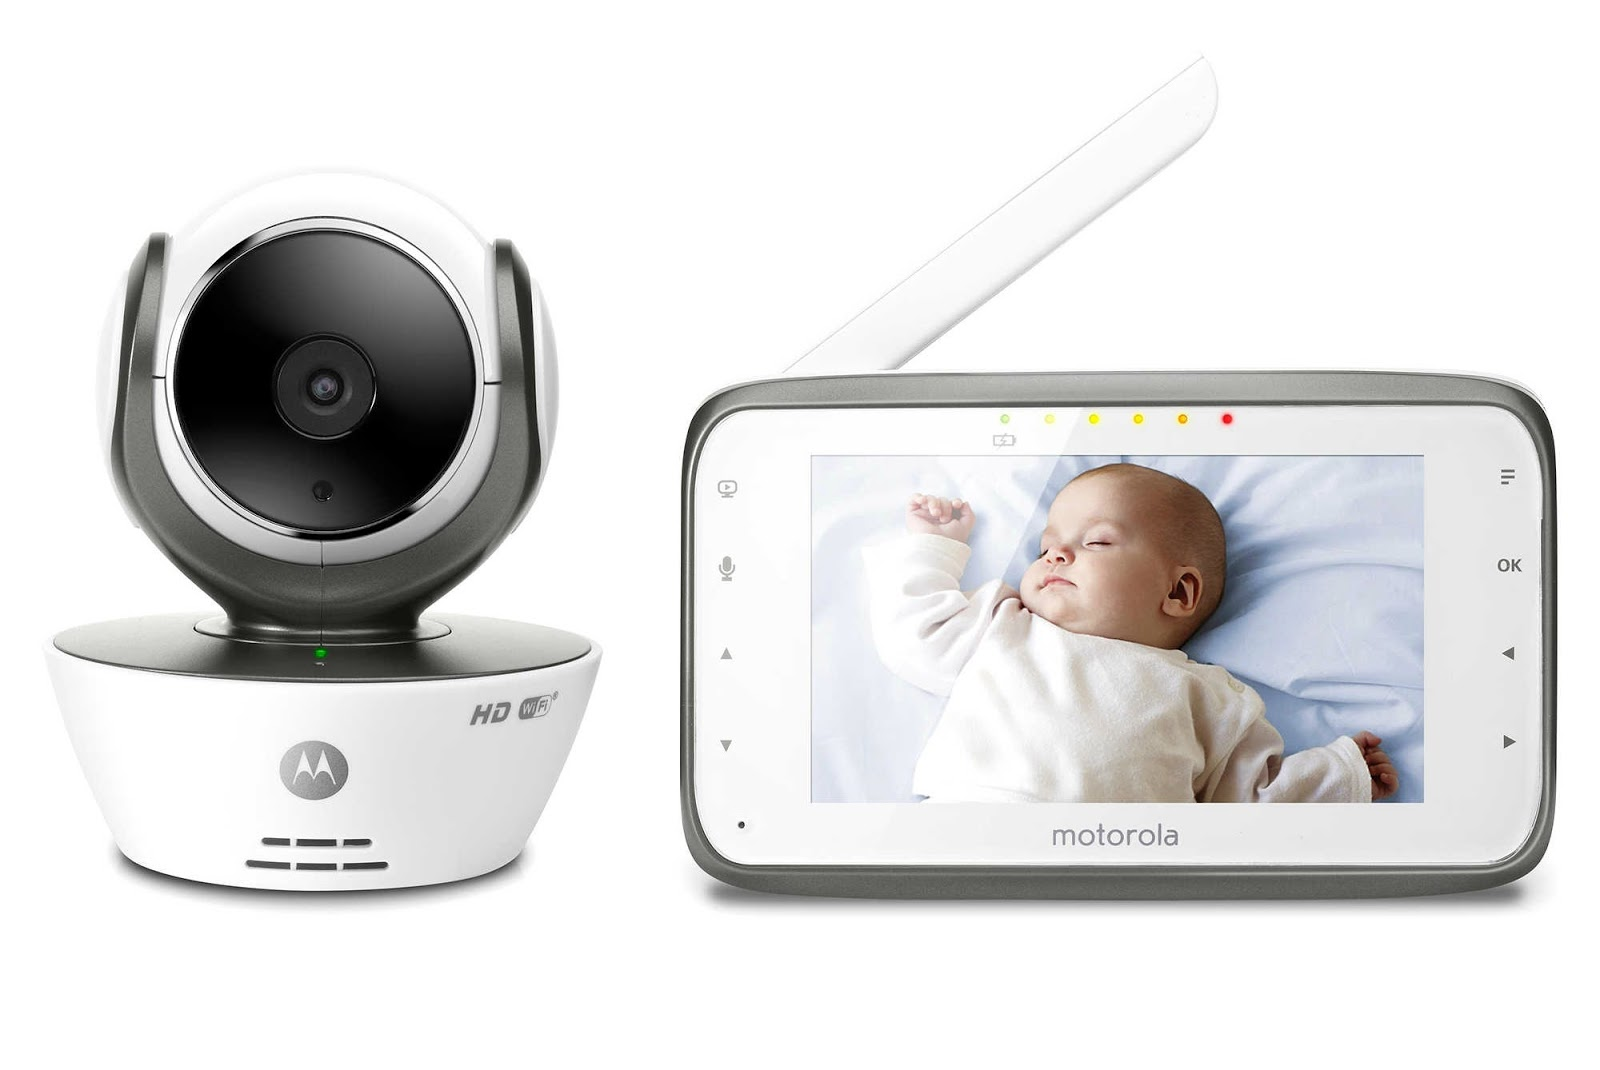 motorola video baby monitor instructions